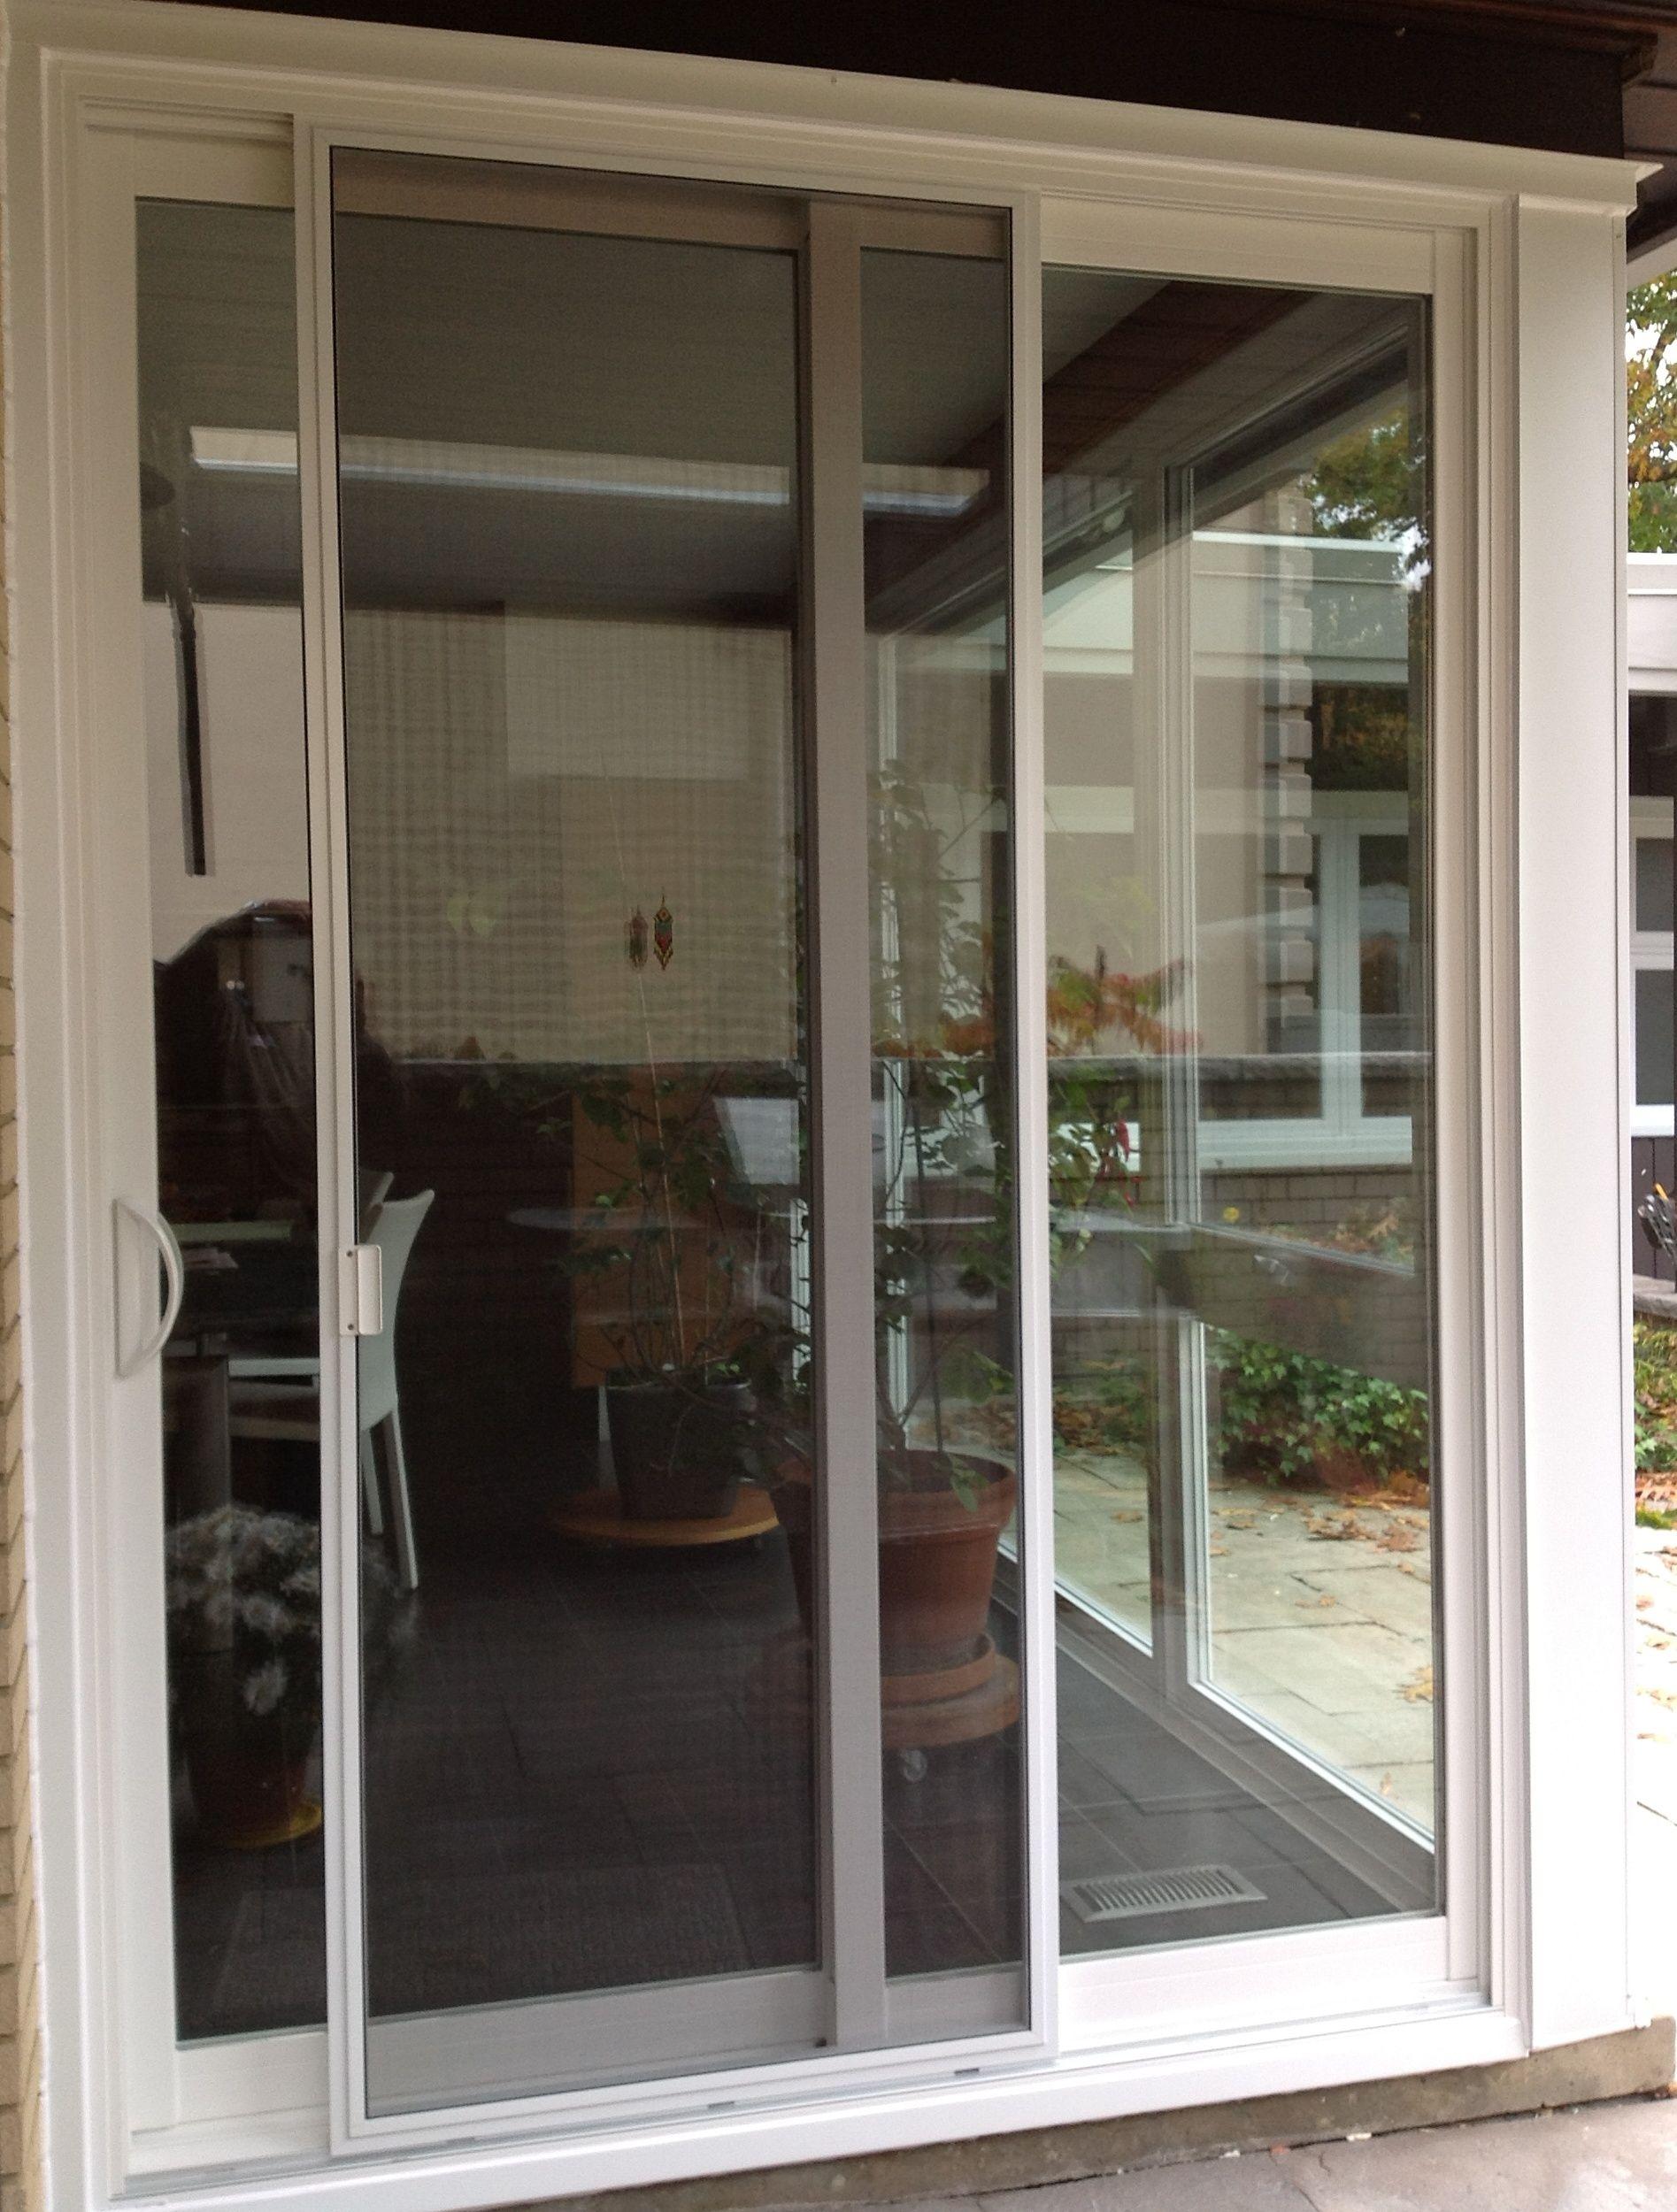 Storm Doors For Sliding Glass Doors Httpthefallguyediting